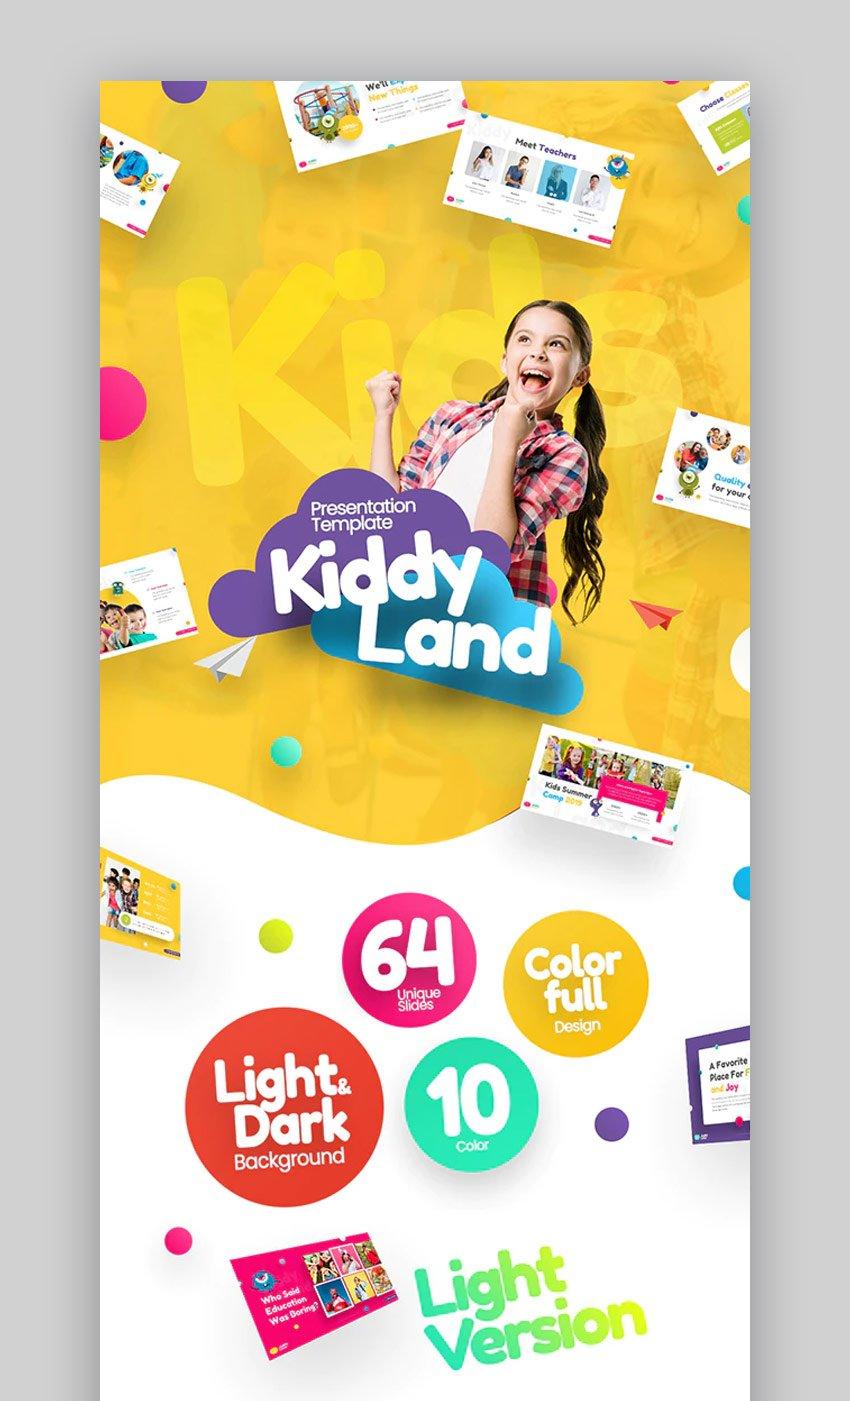 Kiddyland fun PowerPoint theme